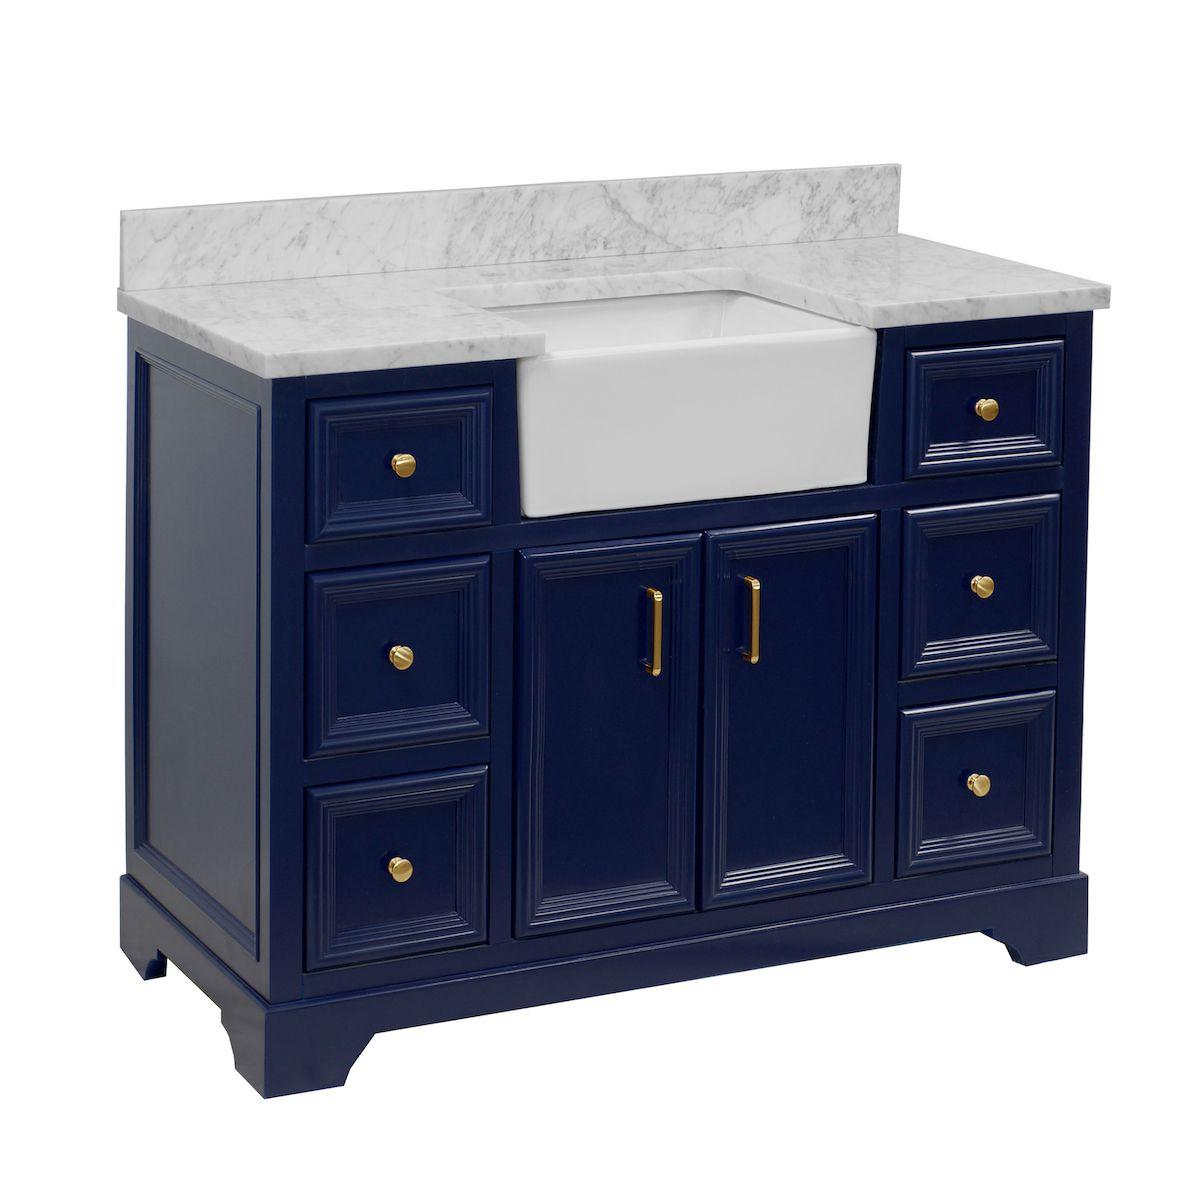 Zelda 48inch Farmhouse Vanity with Carrara Marble Top in